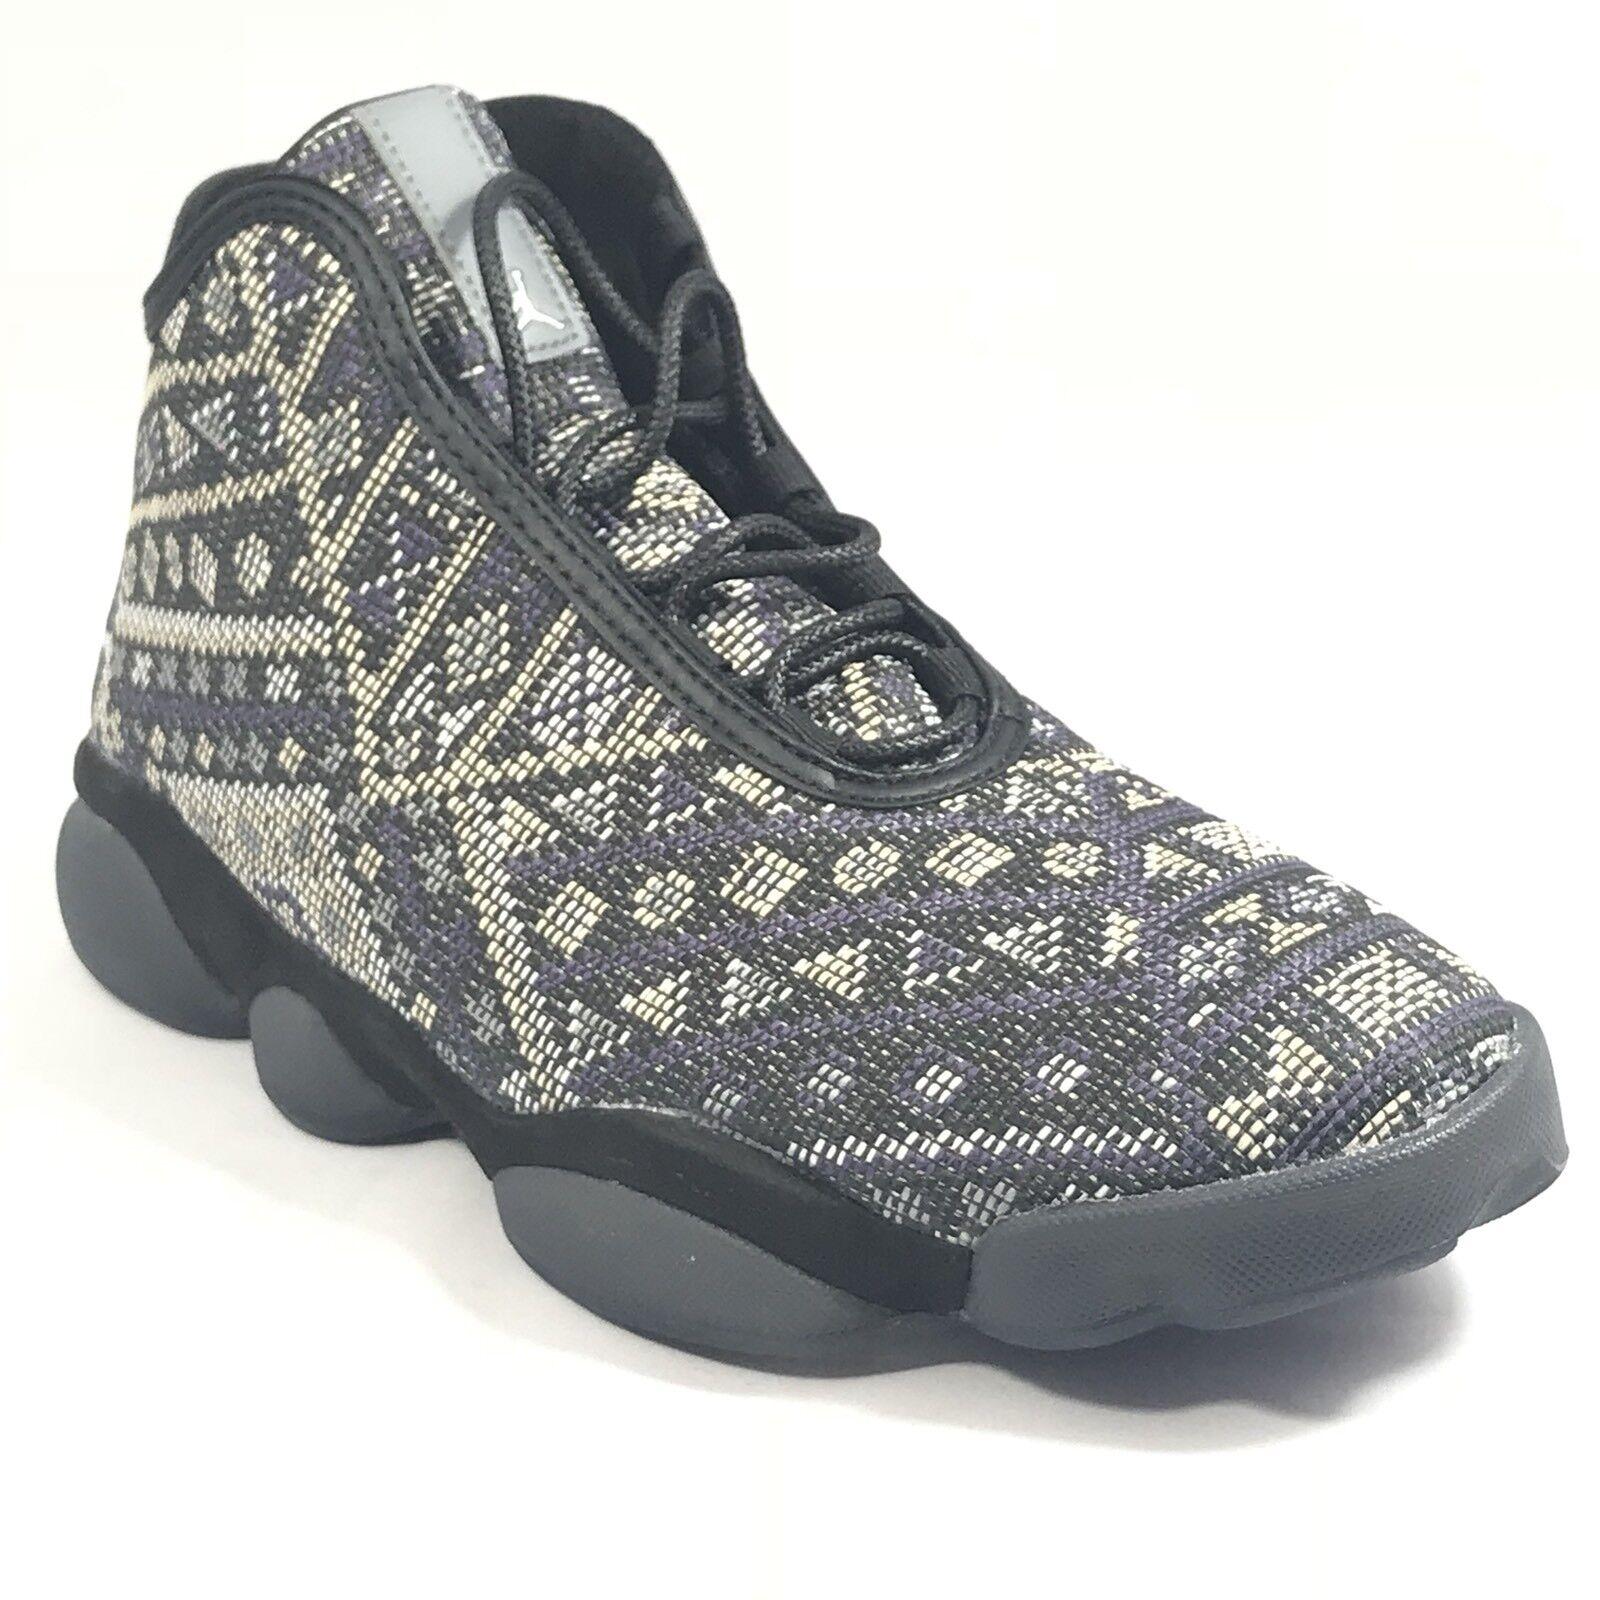 Nike Air Jordan Horizon Premium Size 10.5 Black Purple Steel Charcoal 822333 022